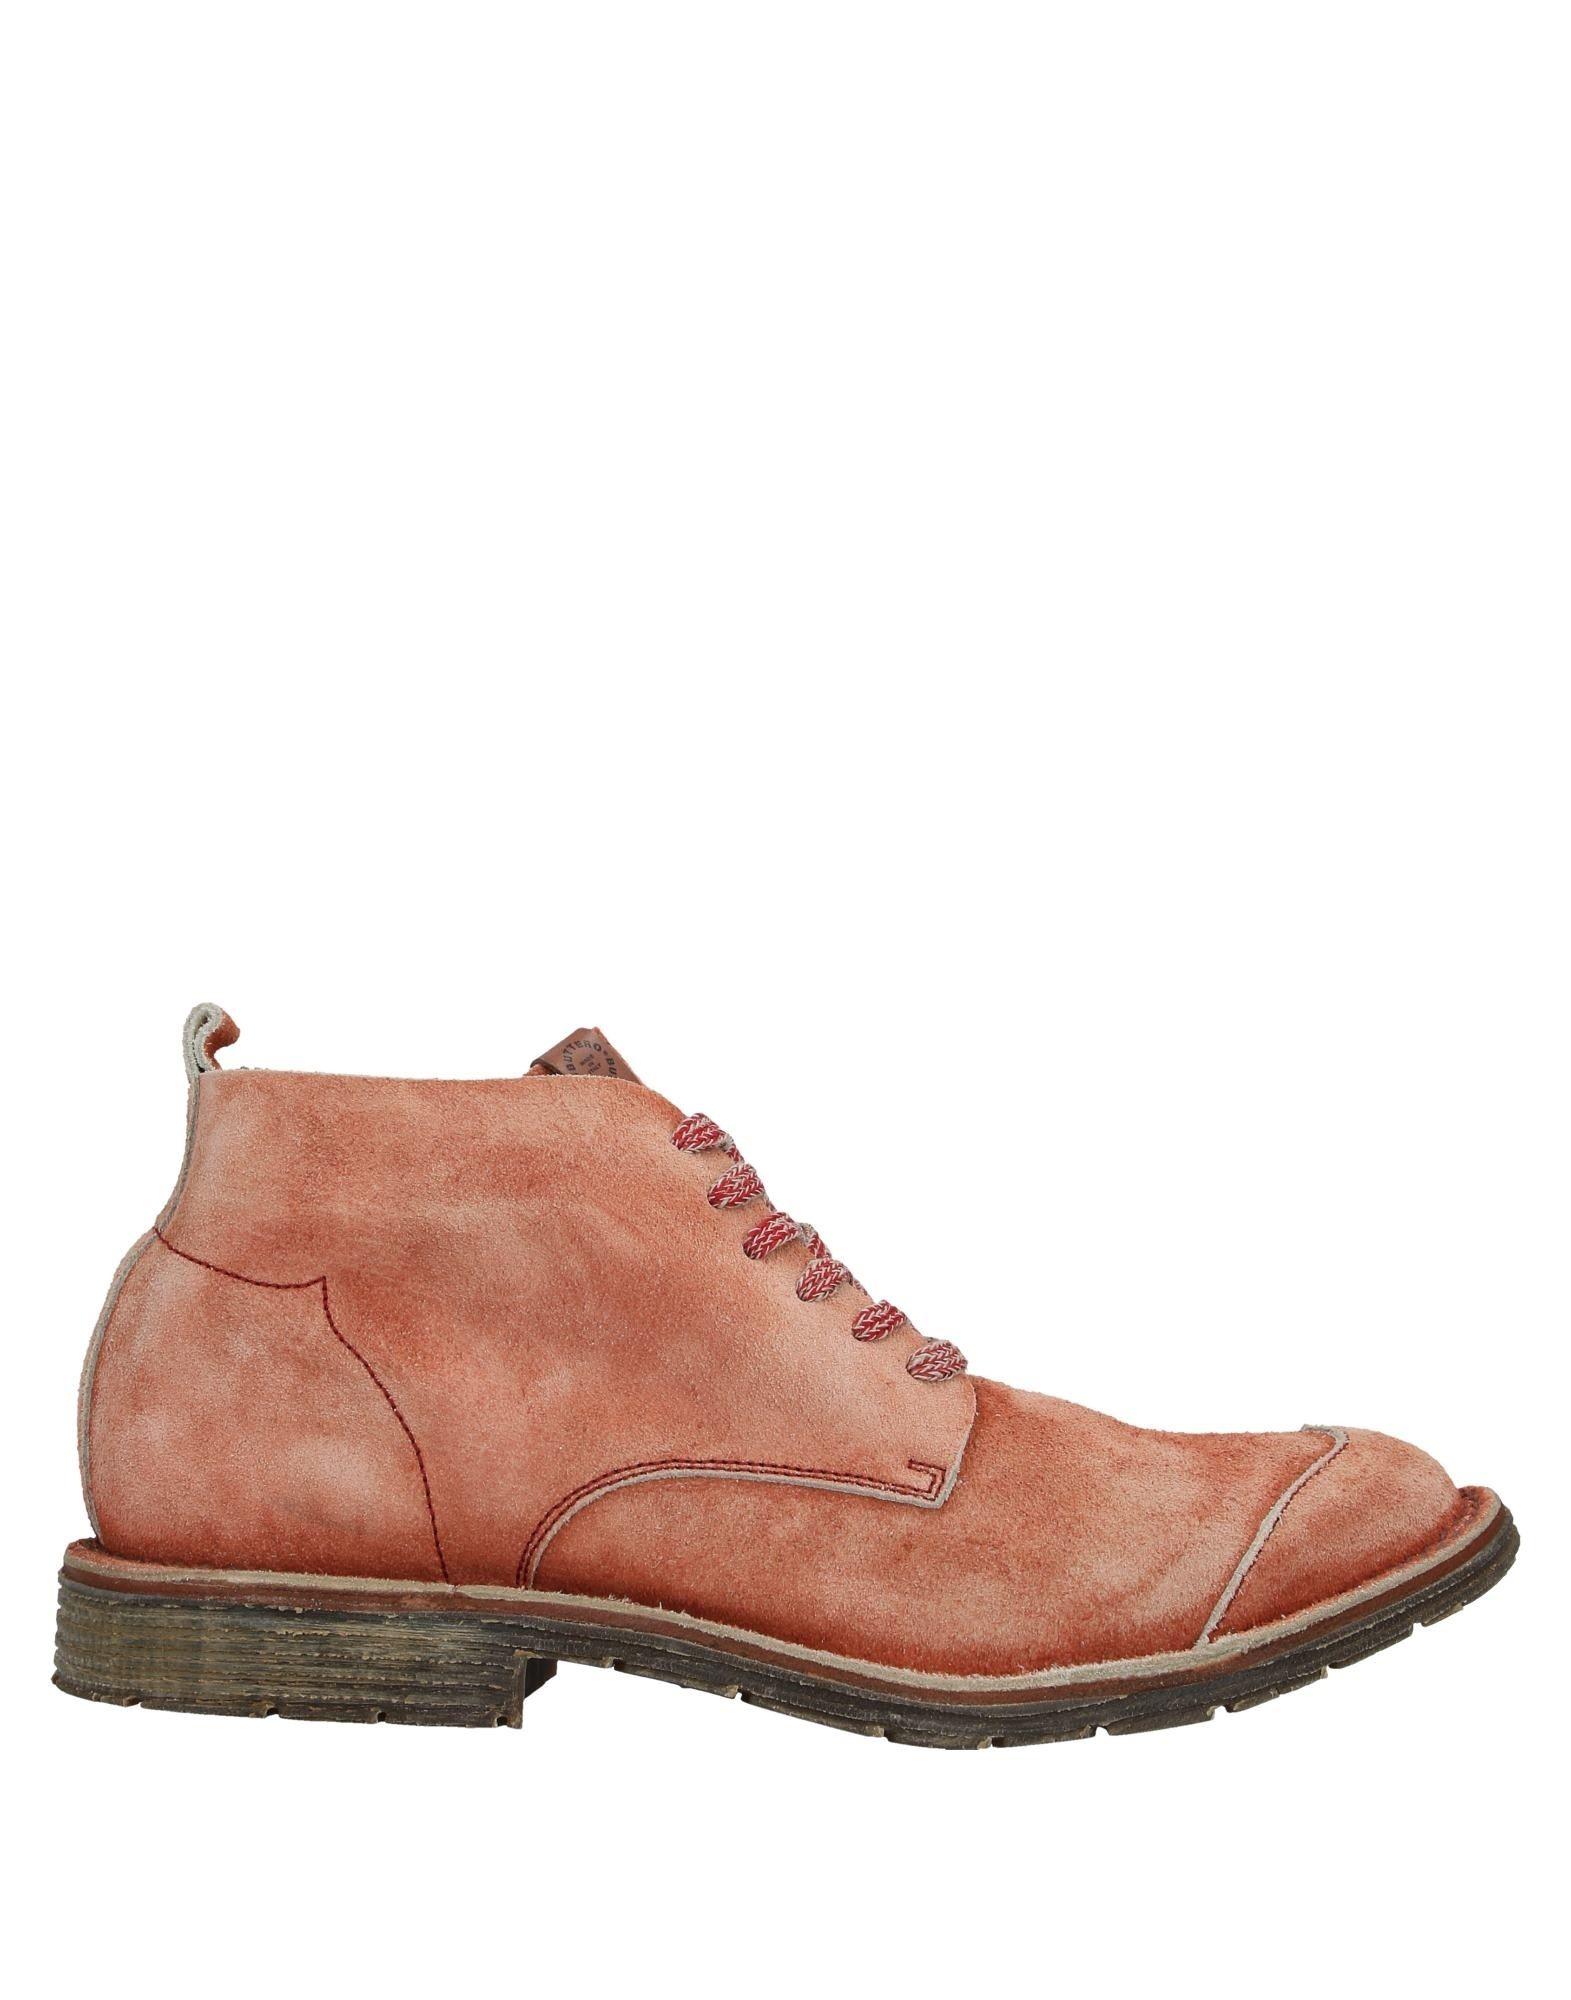 BUTTERO® Полусапоги и высокие ботинки ботинки лыжные nn75 spine nordik размер 41